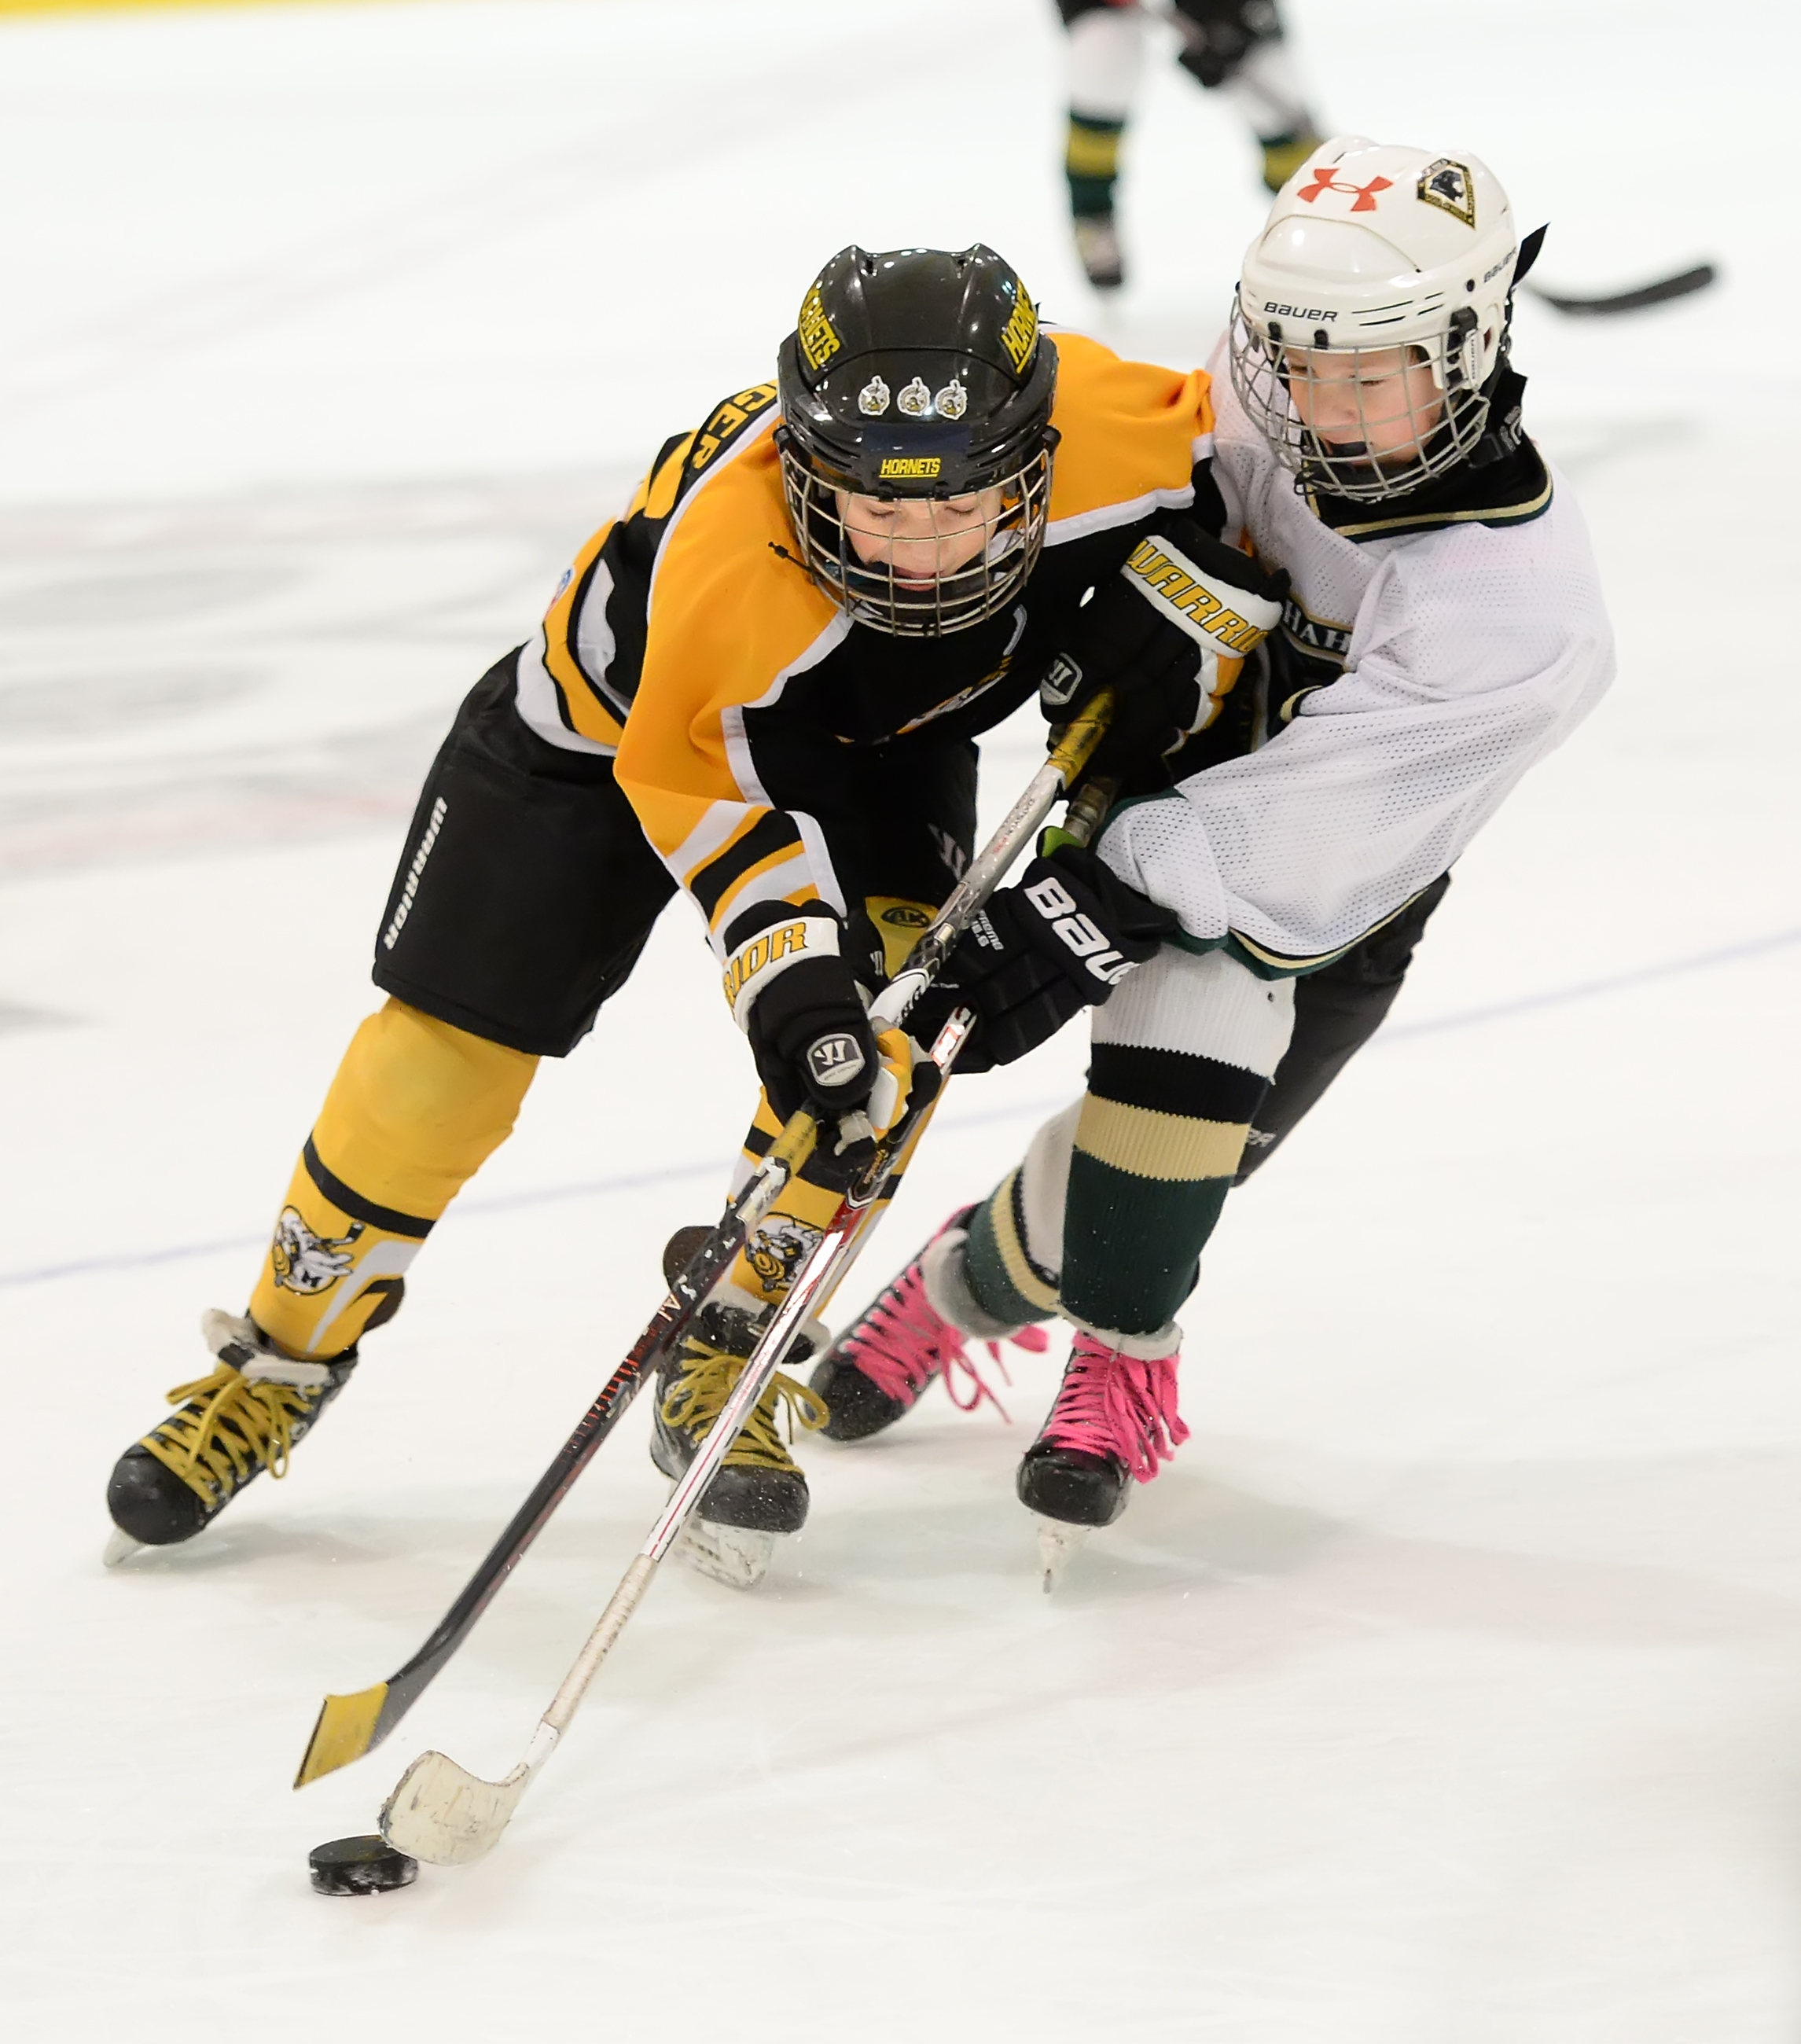 South Hills Amateur Hockey